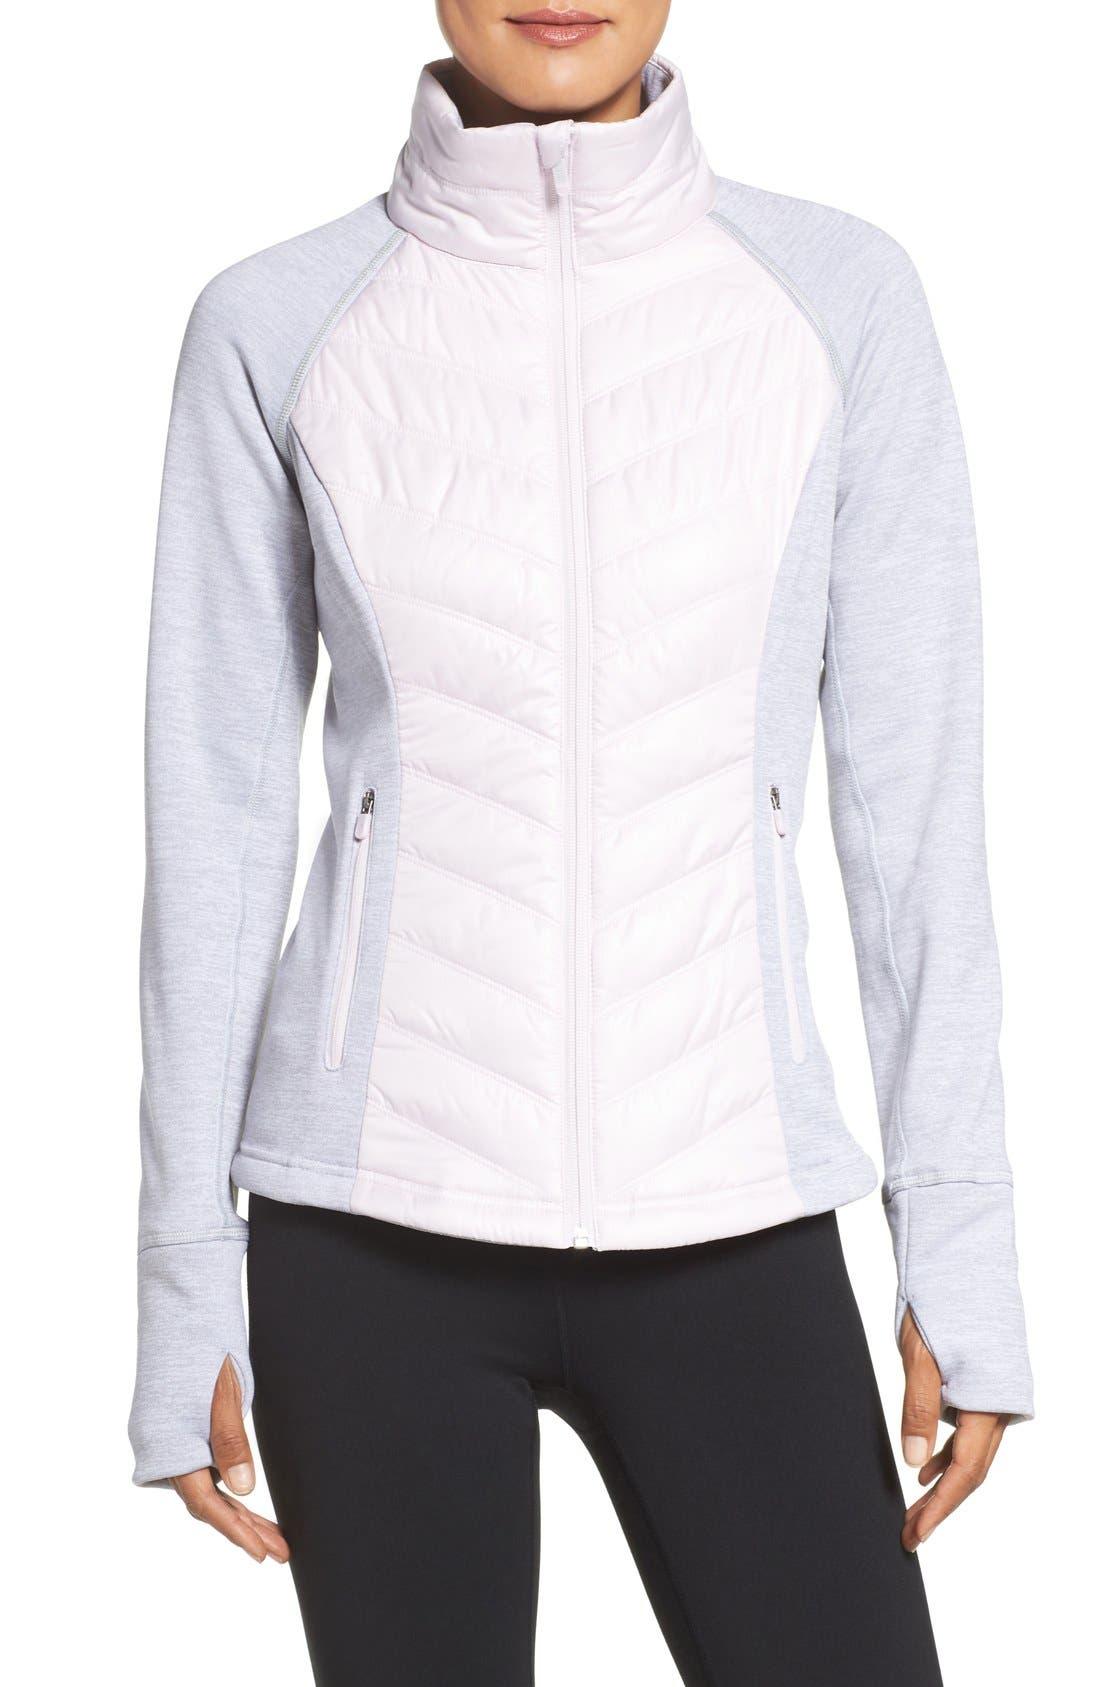 Main Image - Zella Zelfusion Reflective Quilted Jacket